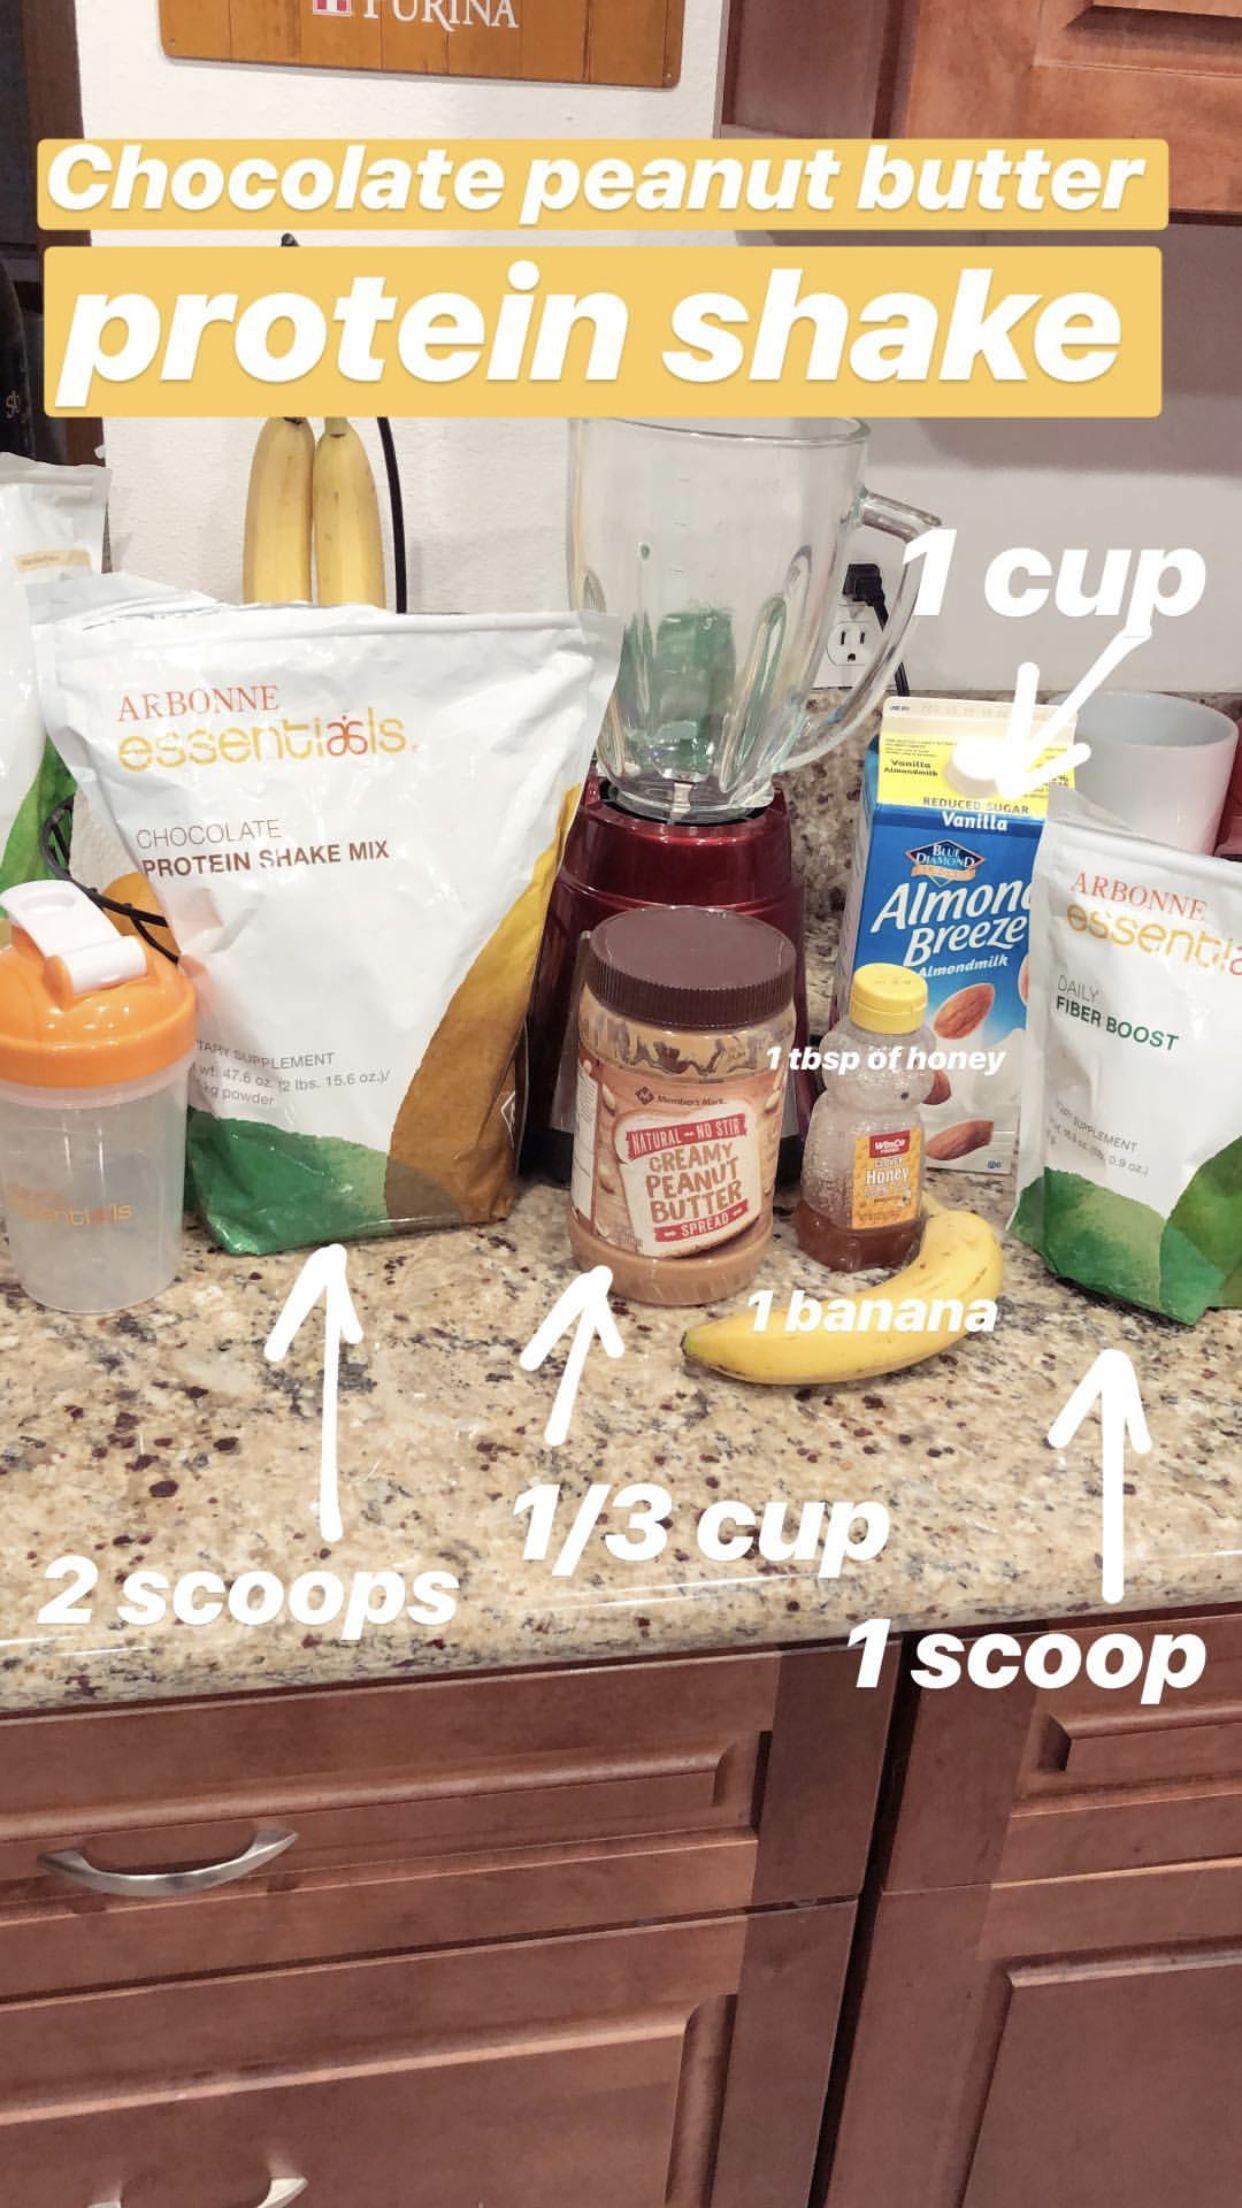 Protein shake #healthychocolateshakes